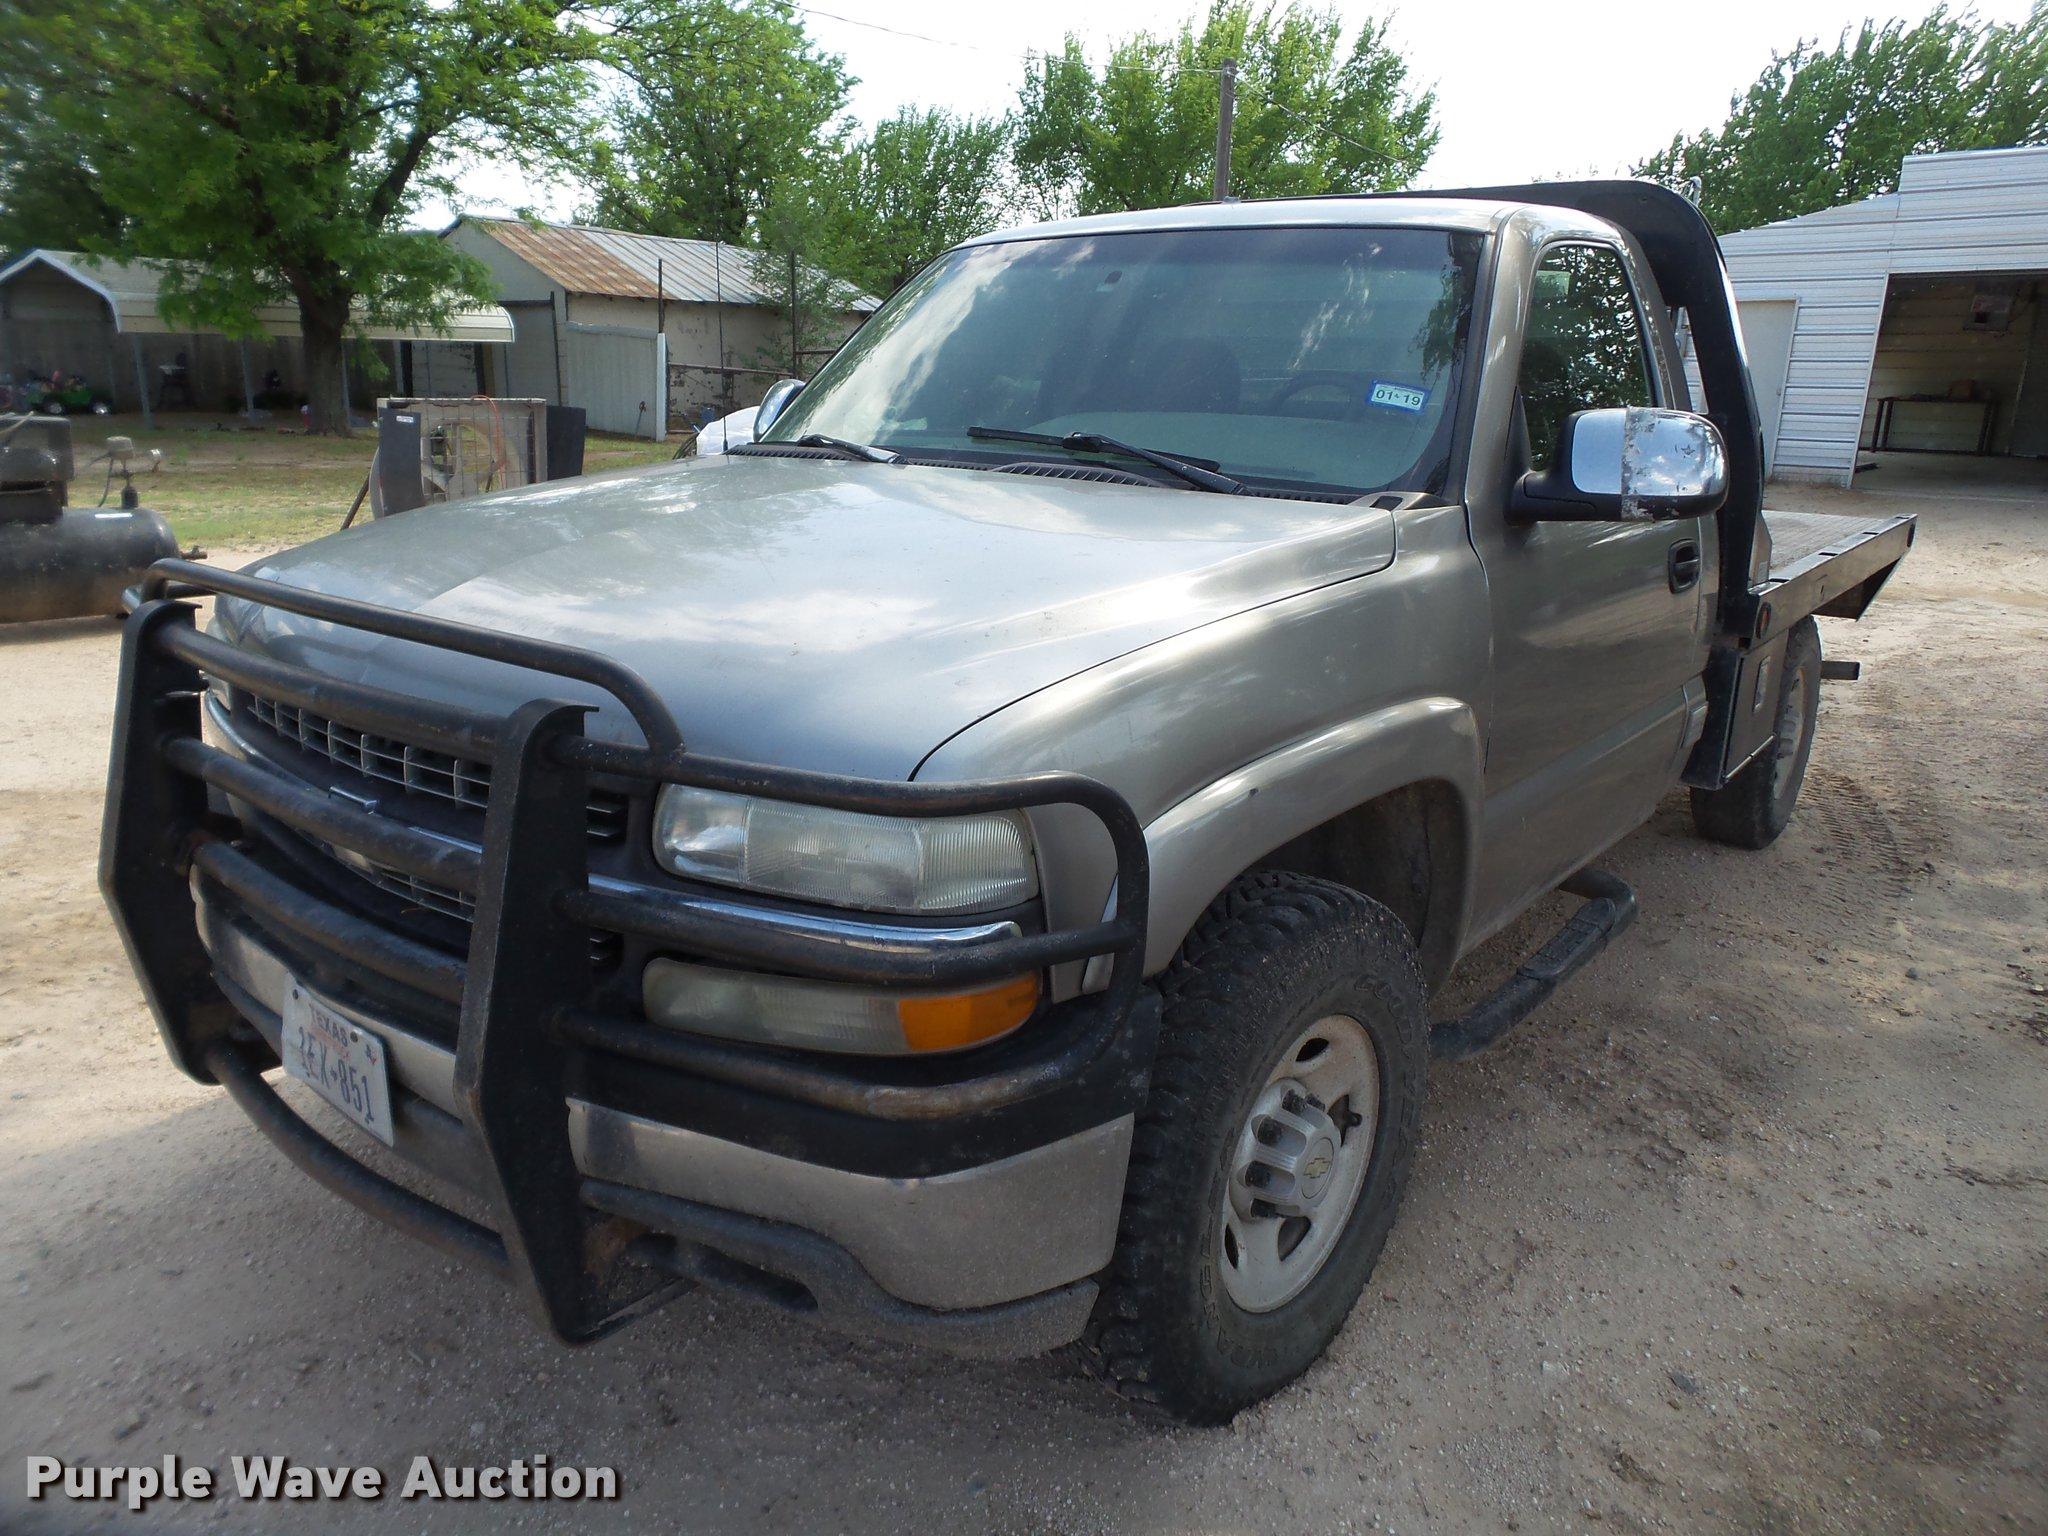 1999 Chevrolet Silverado 2500 flatbed pickup truck